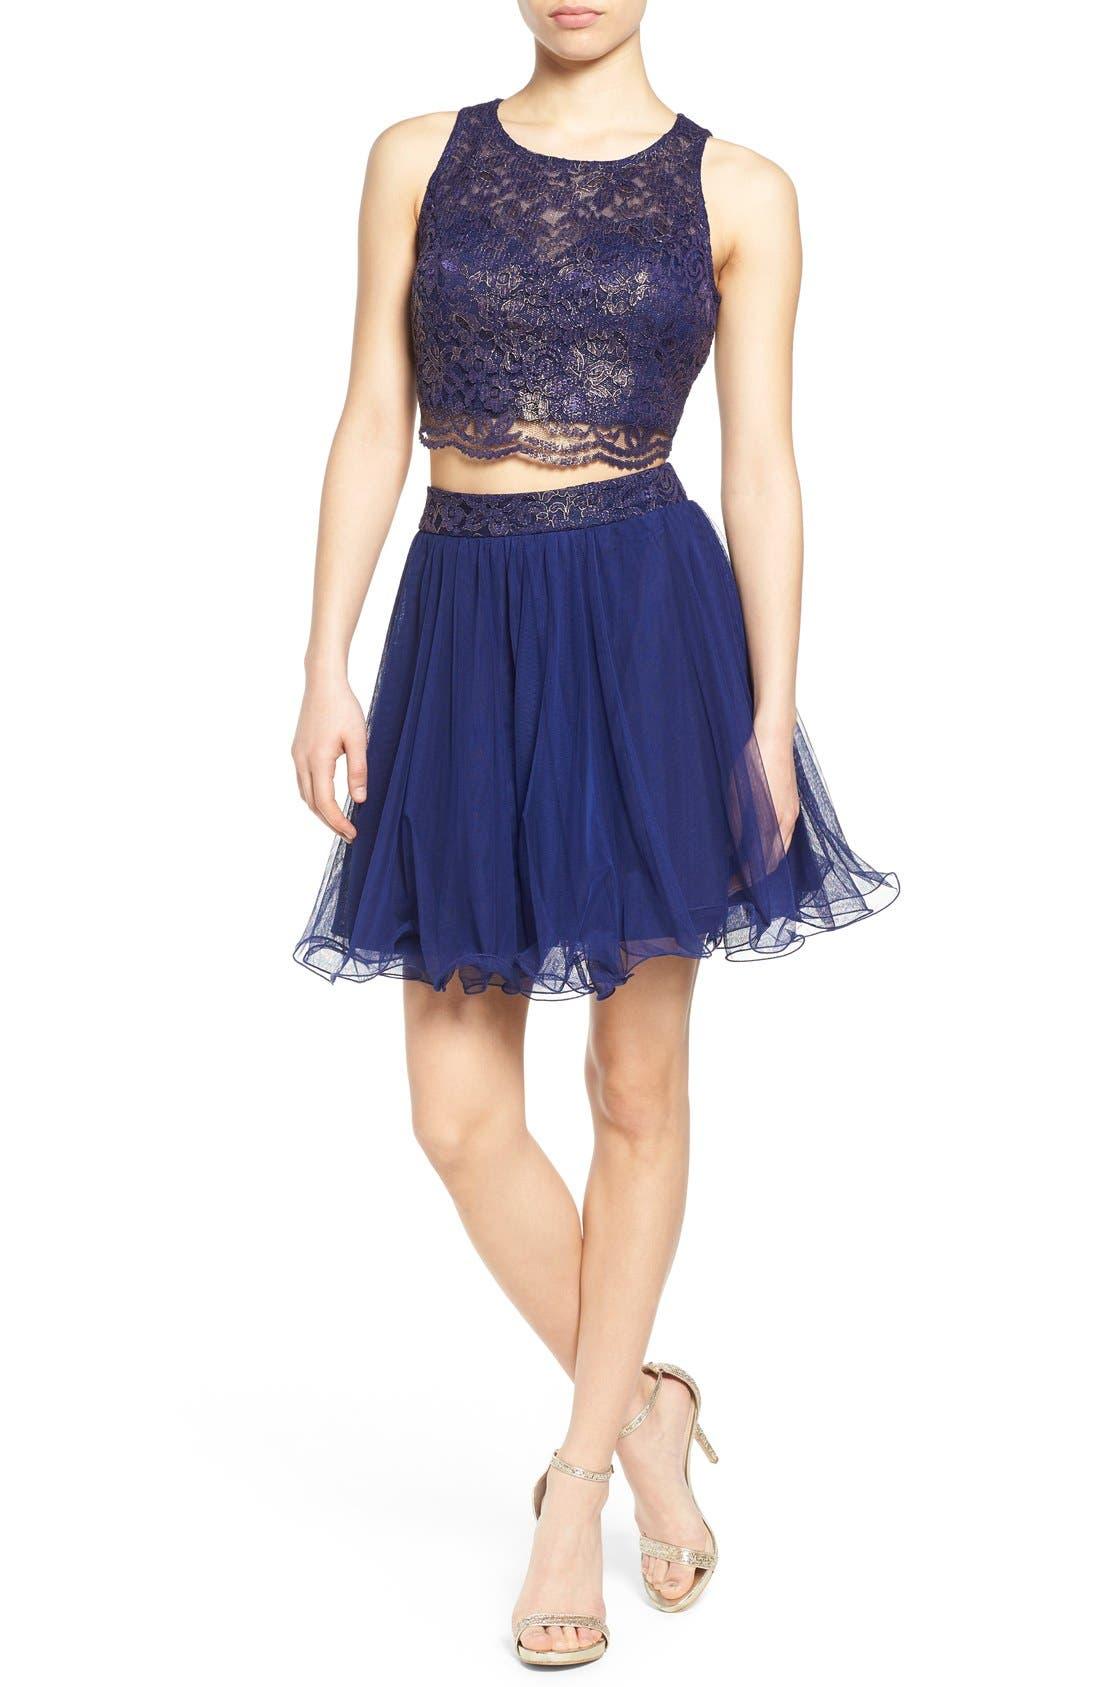 Main Image - Secret Charm 'Gina' Metallic Lace Two-Piece Skater Dress